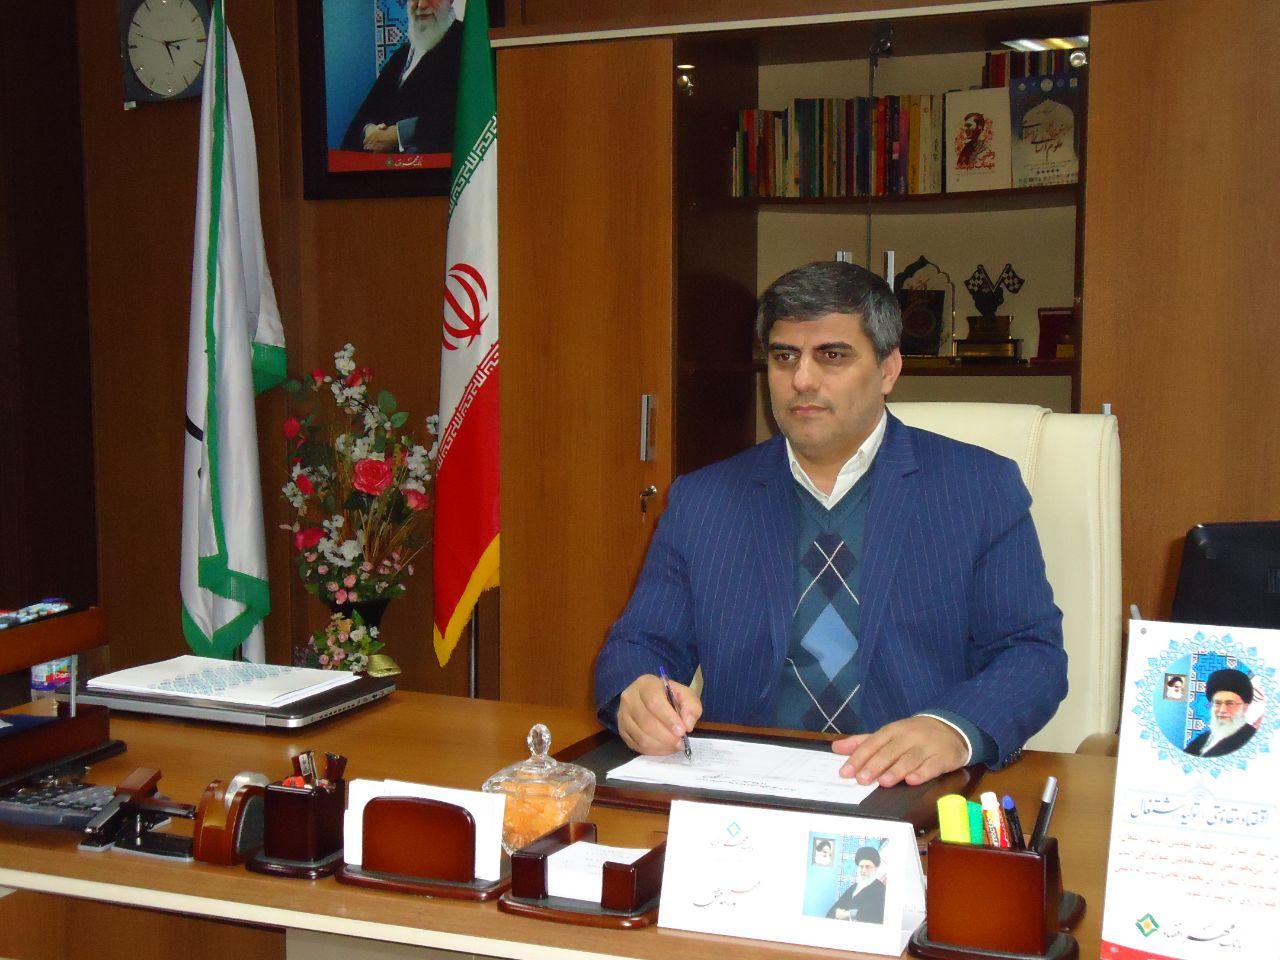 پیامتبریک رییس اداره امور شعب بانک مهر اقتصاد گیلان بمناسبت چهل سالگی انقلاب اسلامی